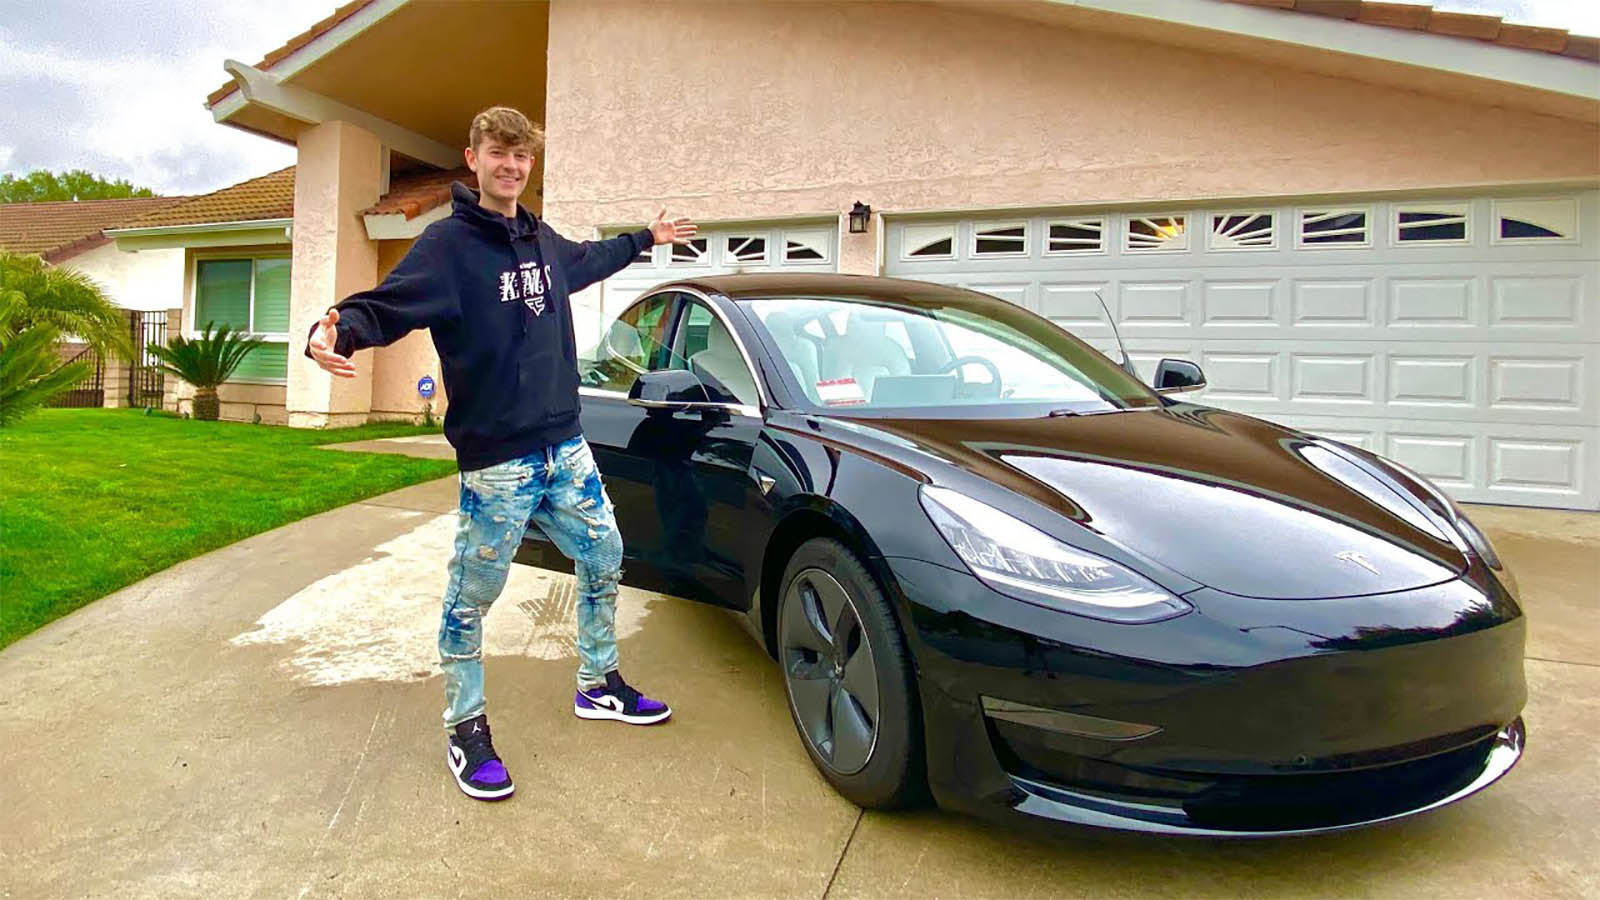 FaZe Blaze Tesla Model 3